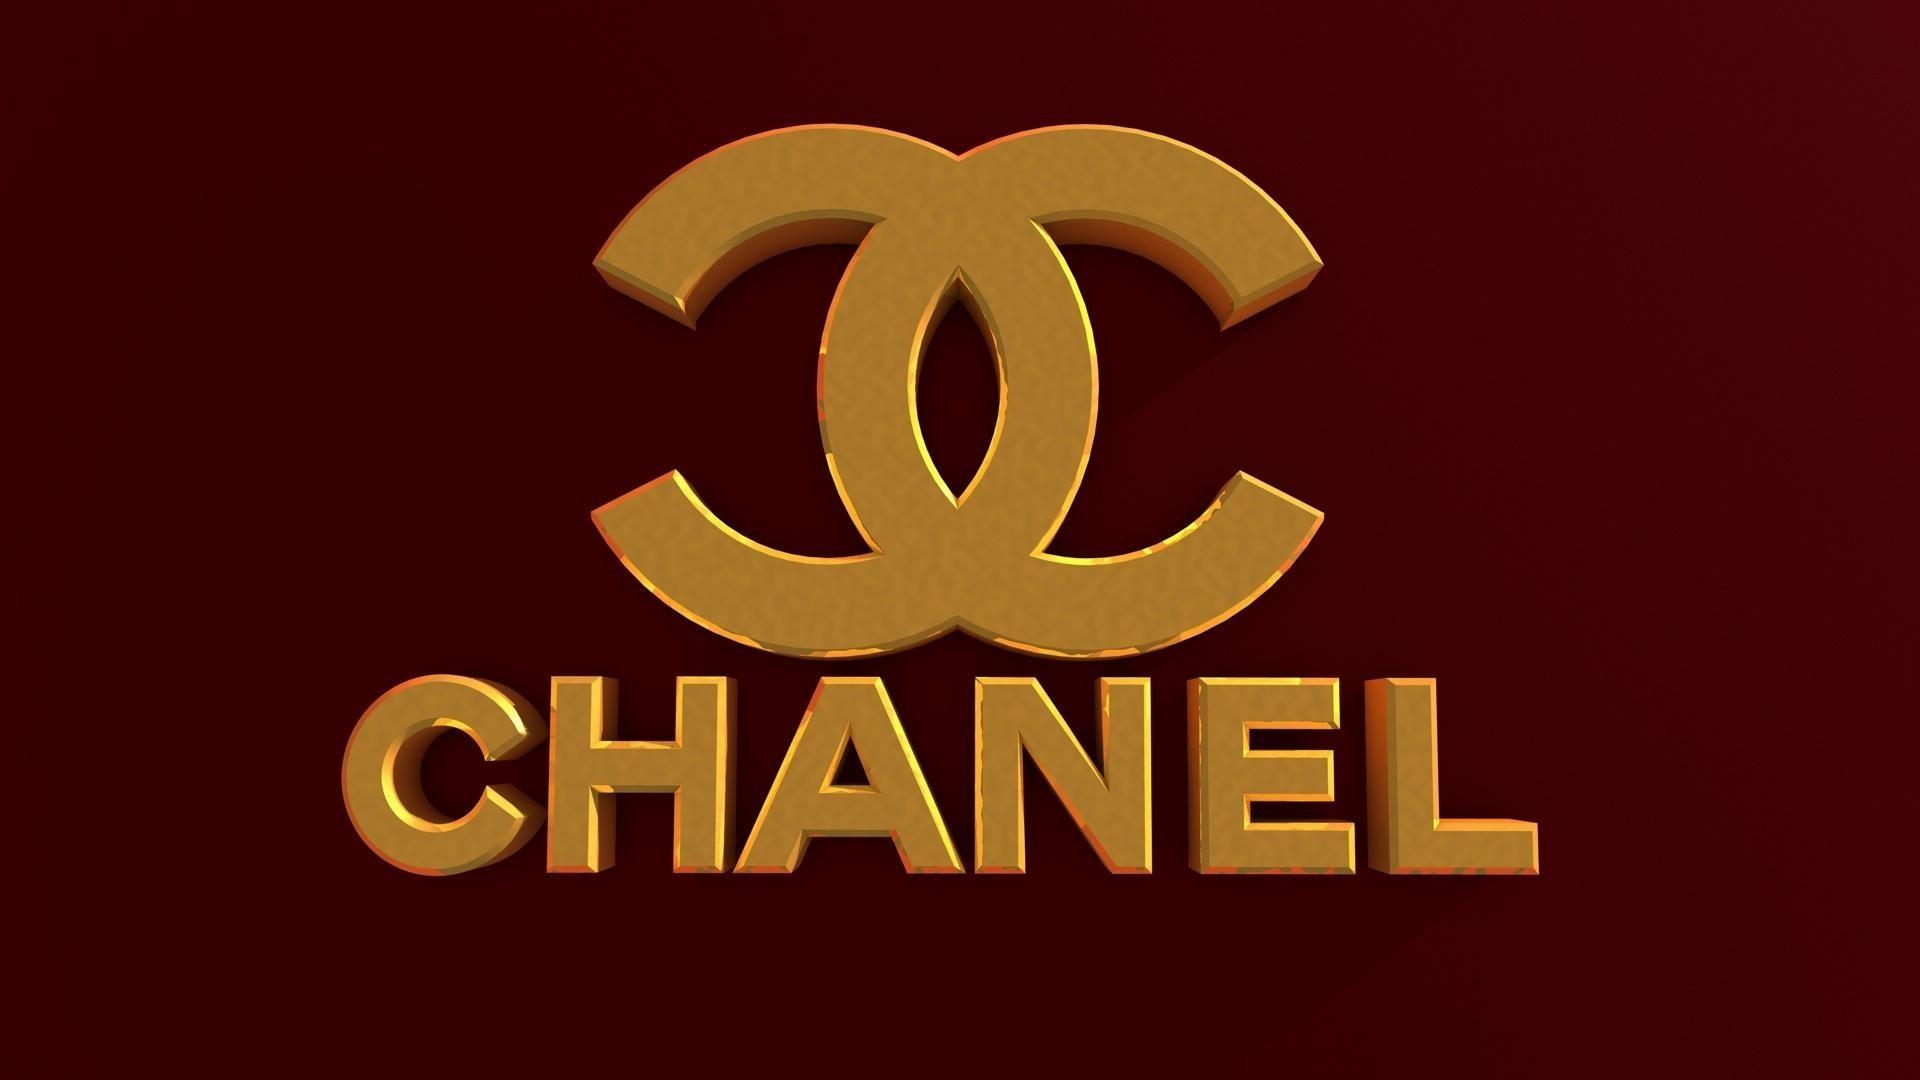 Chanel-logo-HD-1920%C3%971080-wallpaper-wp3403824